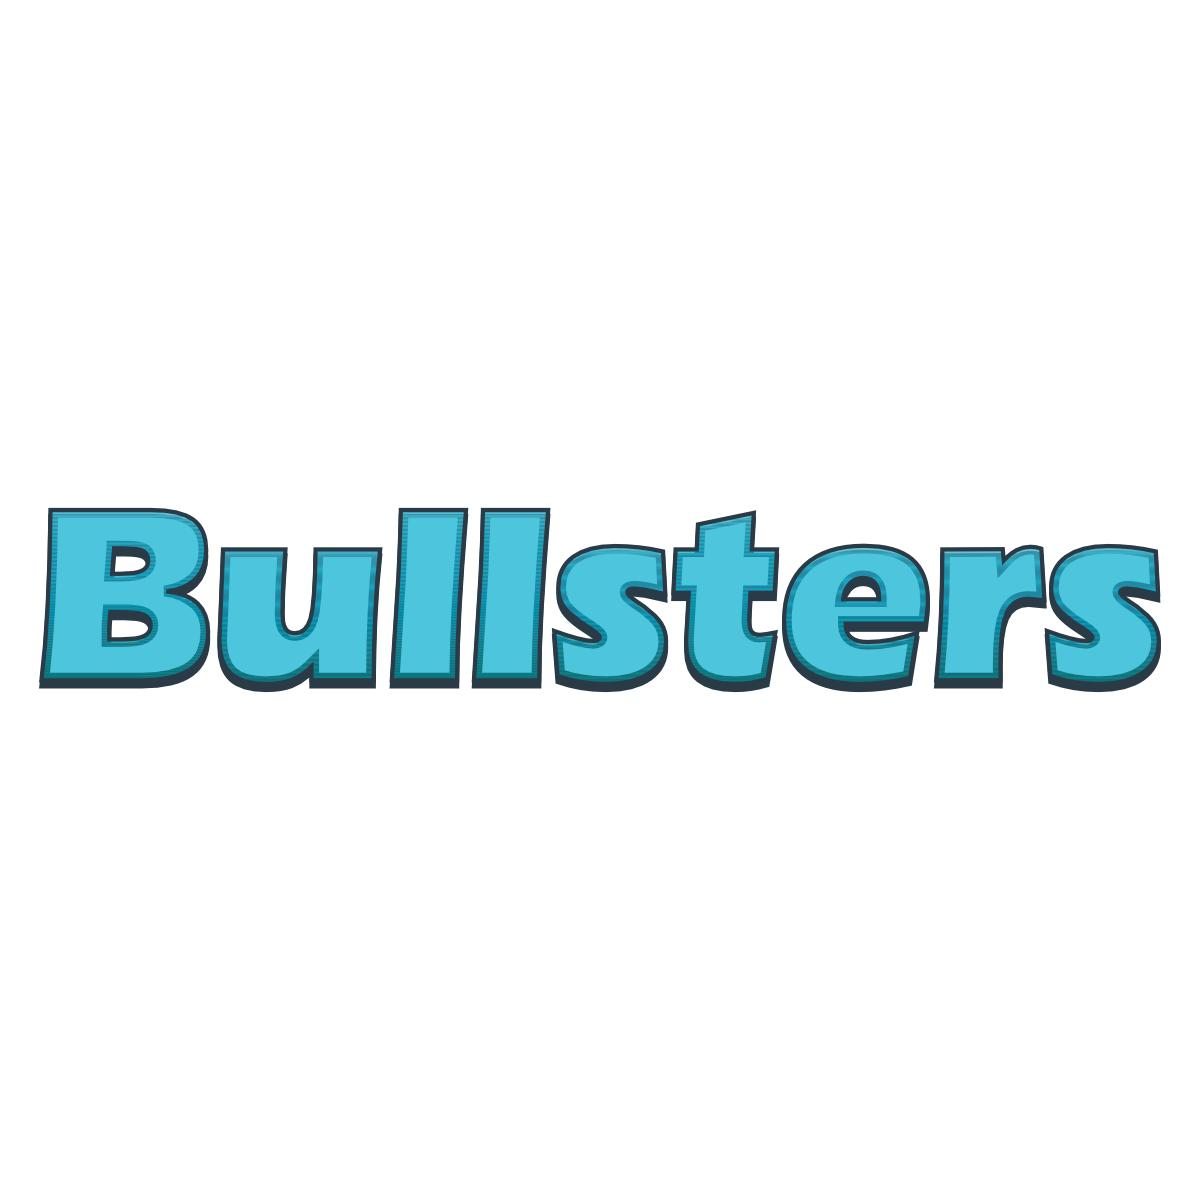 Bullsters